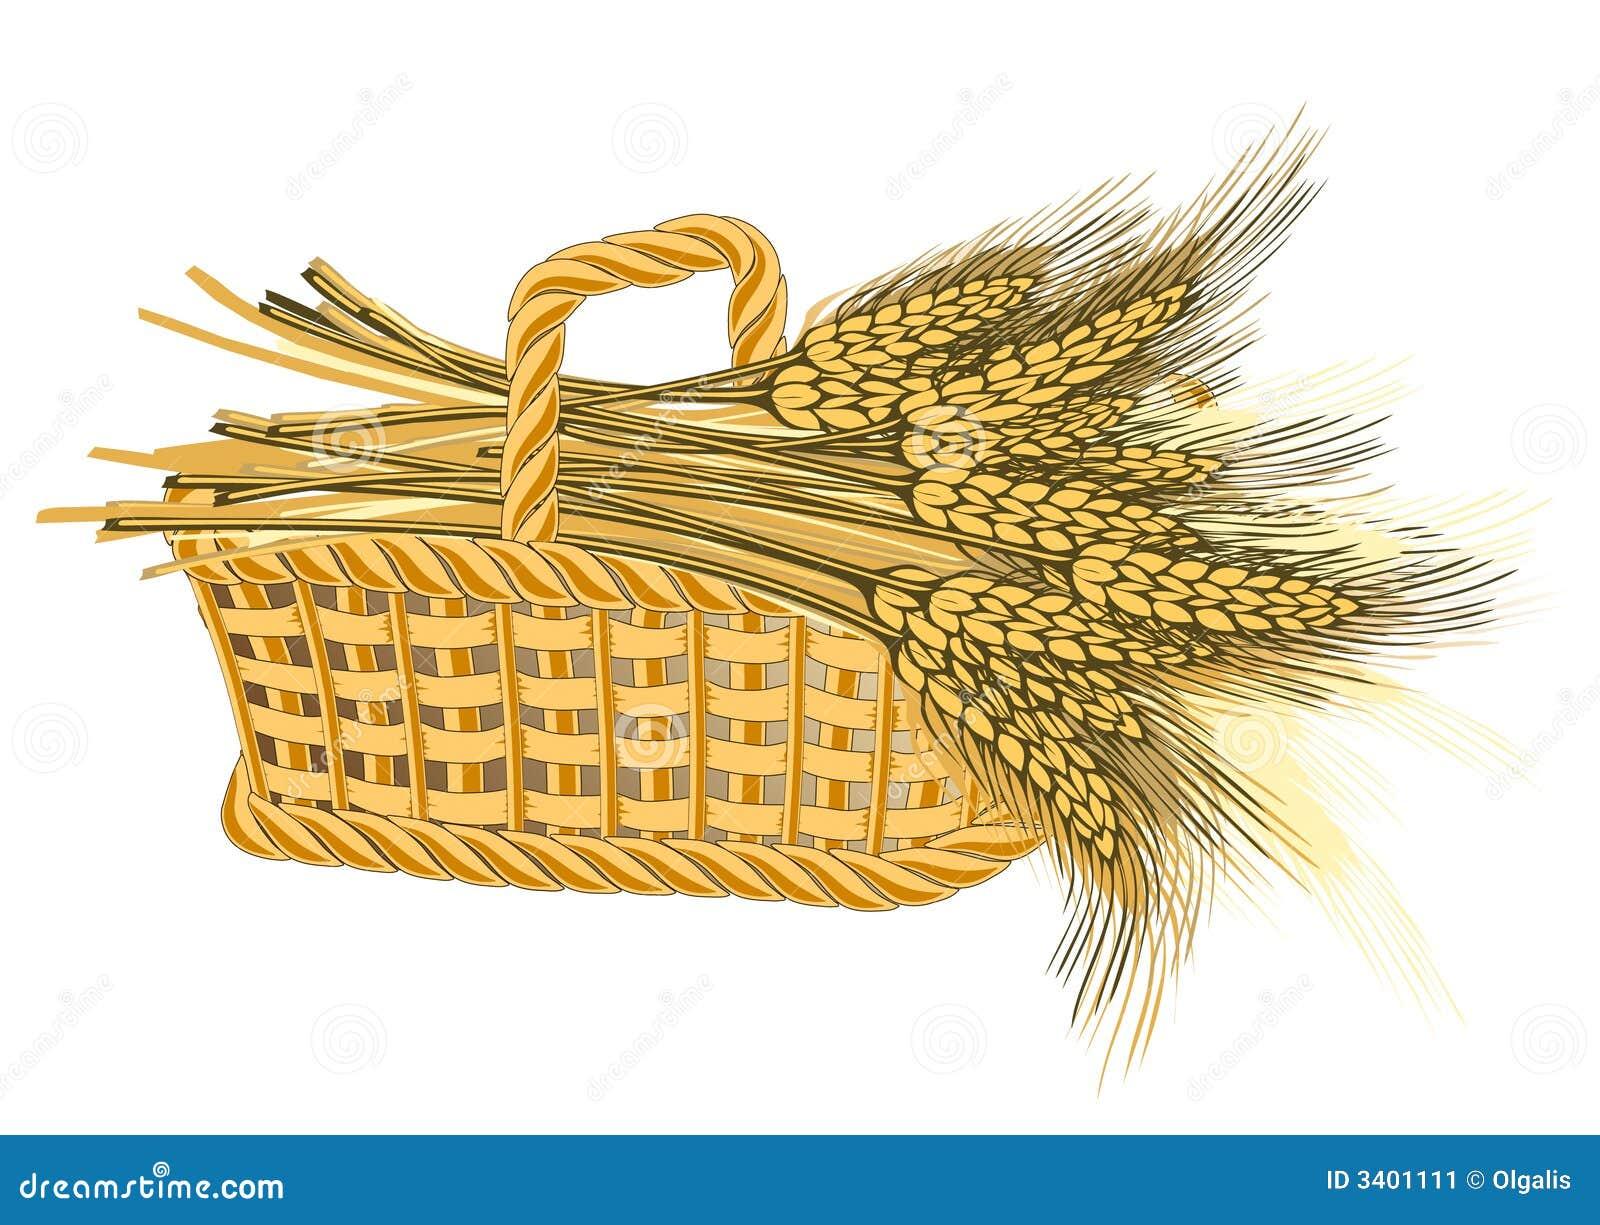 Wheat Harvest In Basket Stock Image Image 3401111